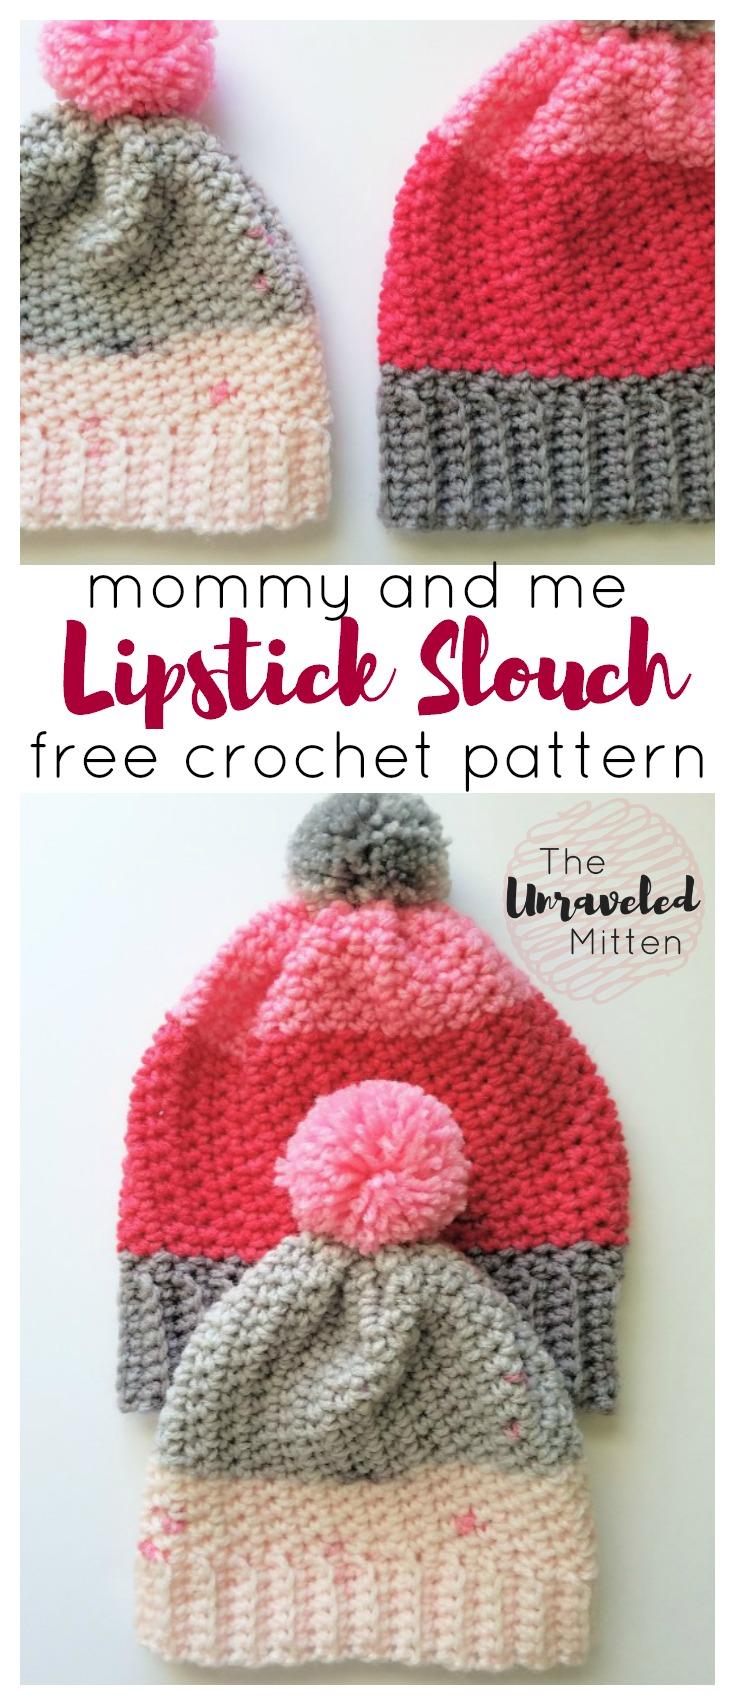 Lipstick Slouchy Hat | Adult & Toddler Size | Free Crochet Pattern using Bernat Pop Yarn | The Unraveled Mitten